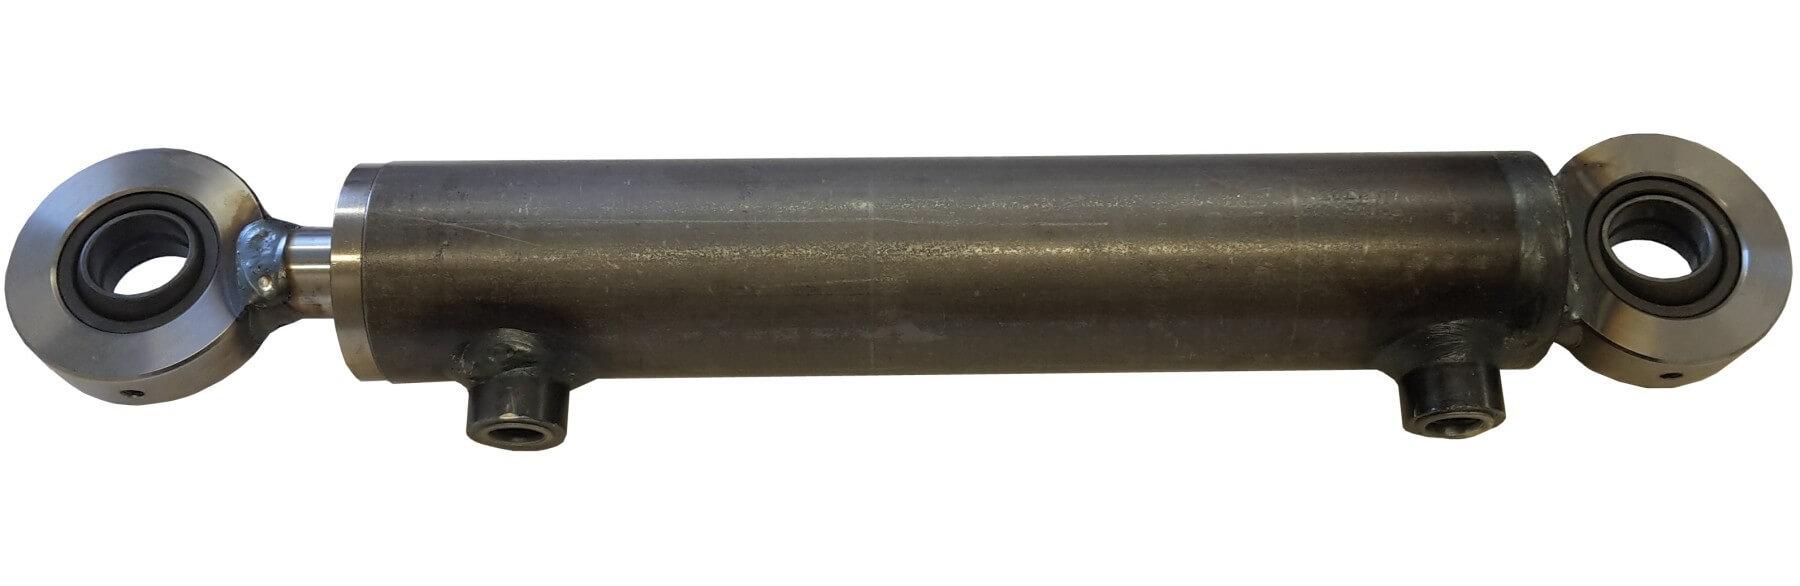 Hydraulisylinteri CL 70. 40. 400 GE